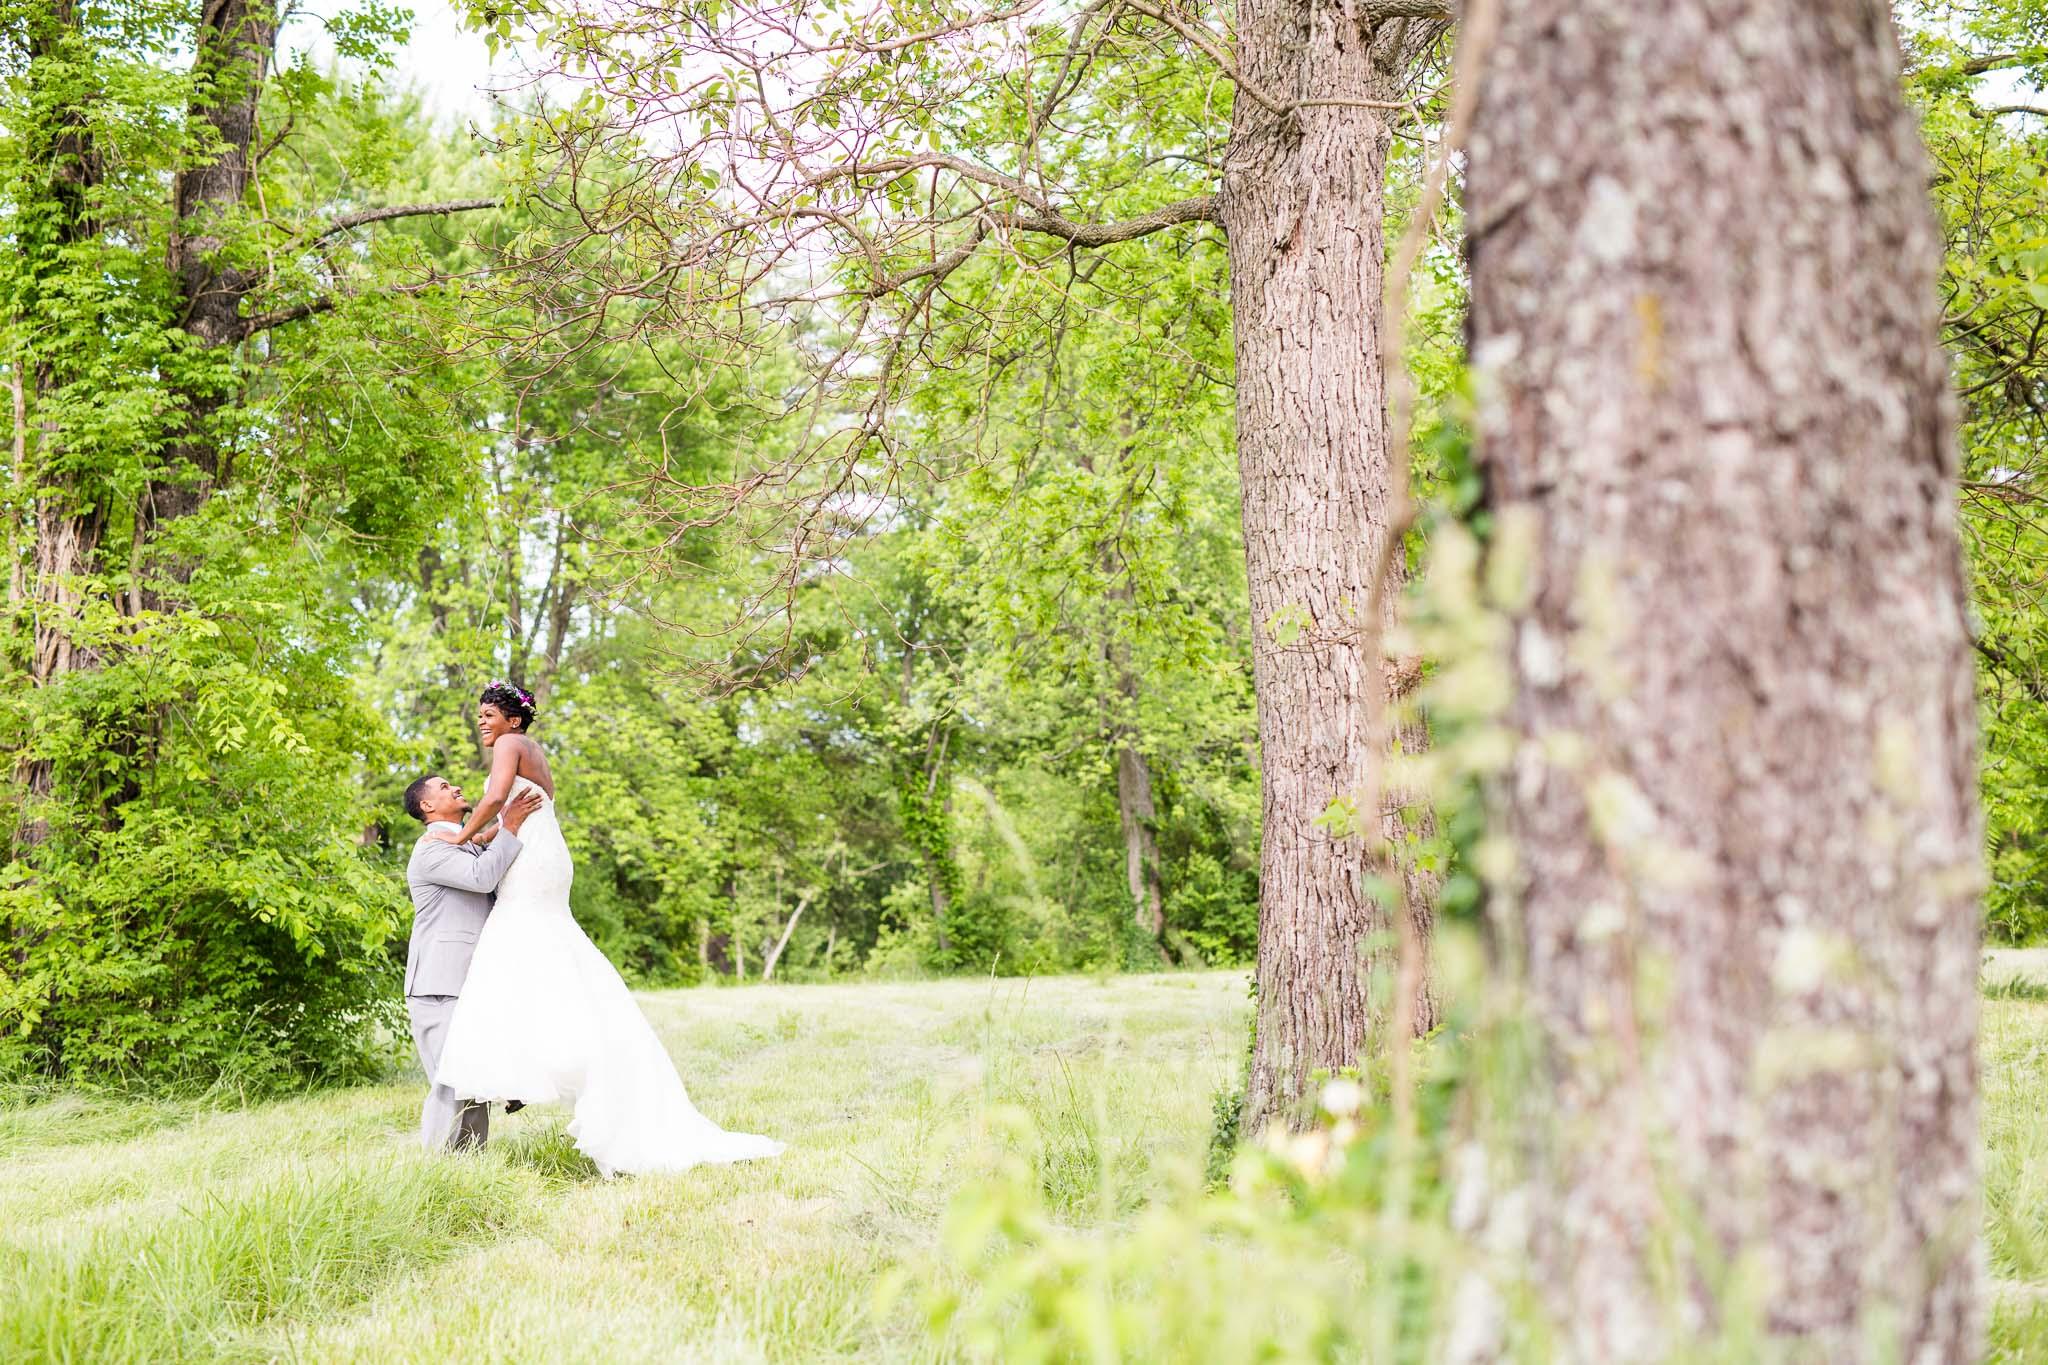 st-louis-photographer-machinist-hall-wedding-16.jpg